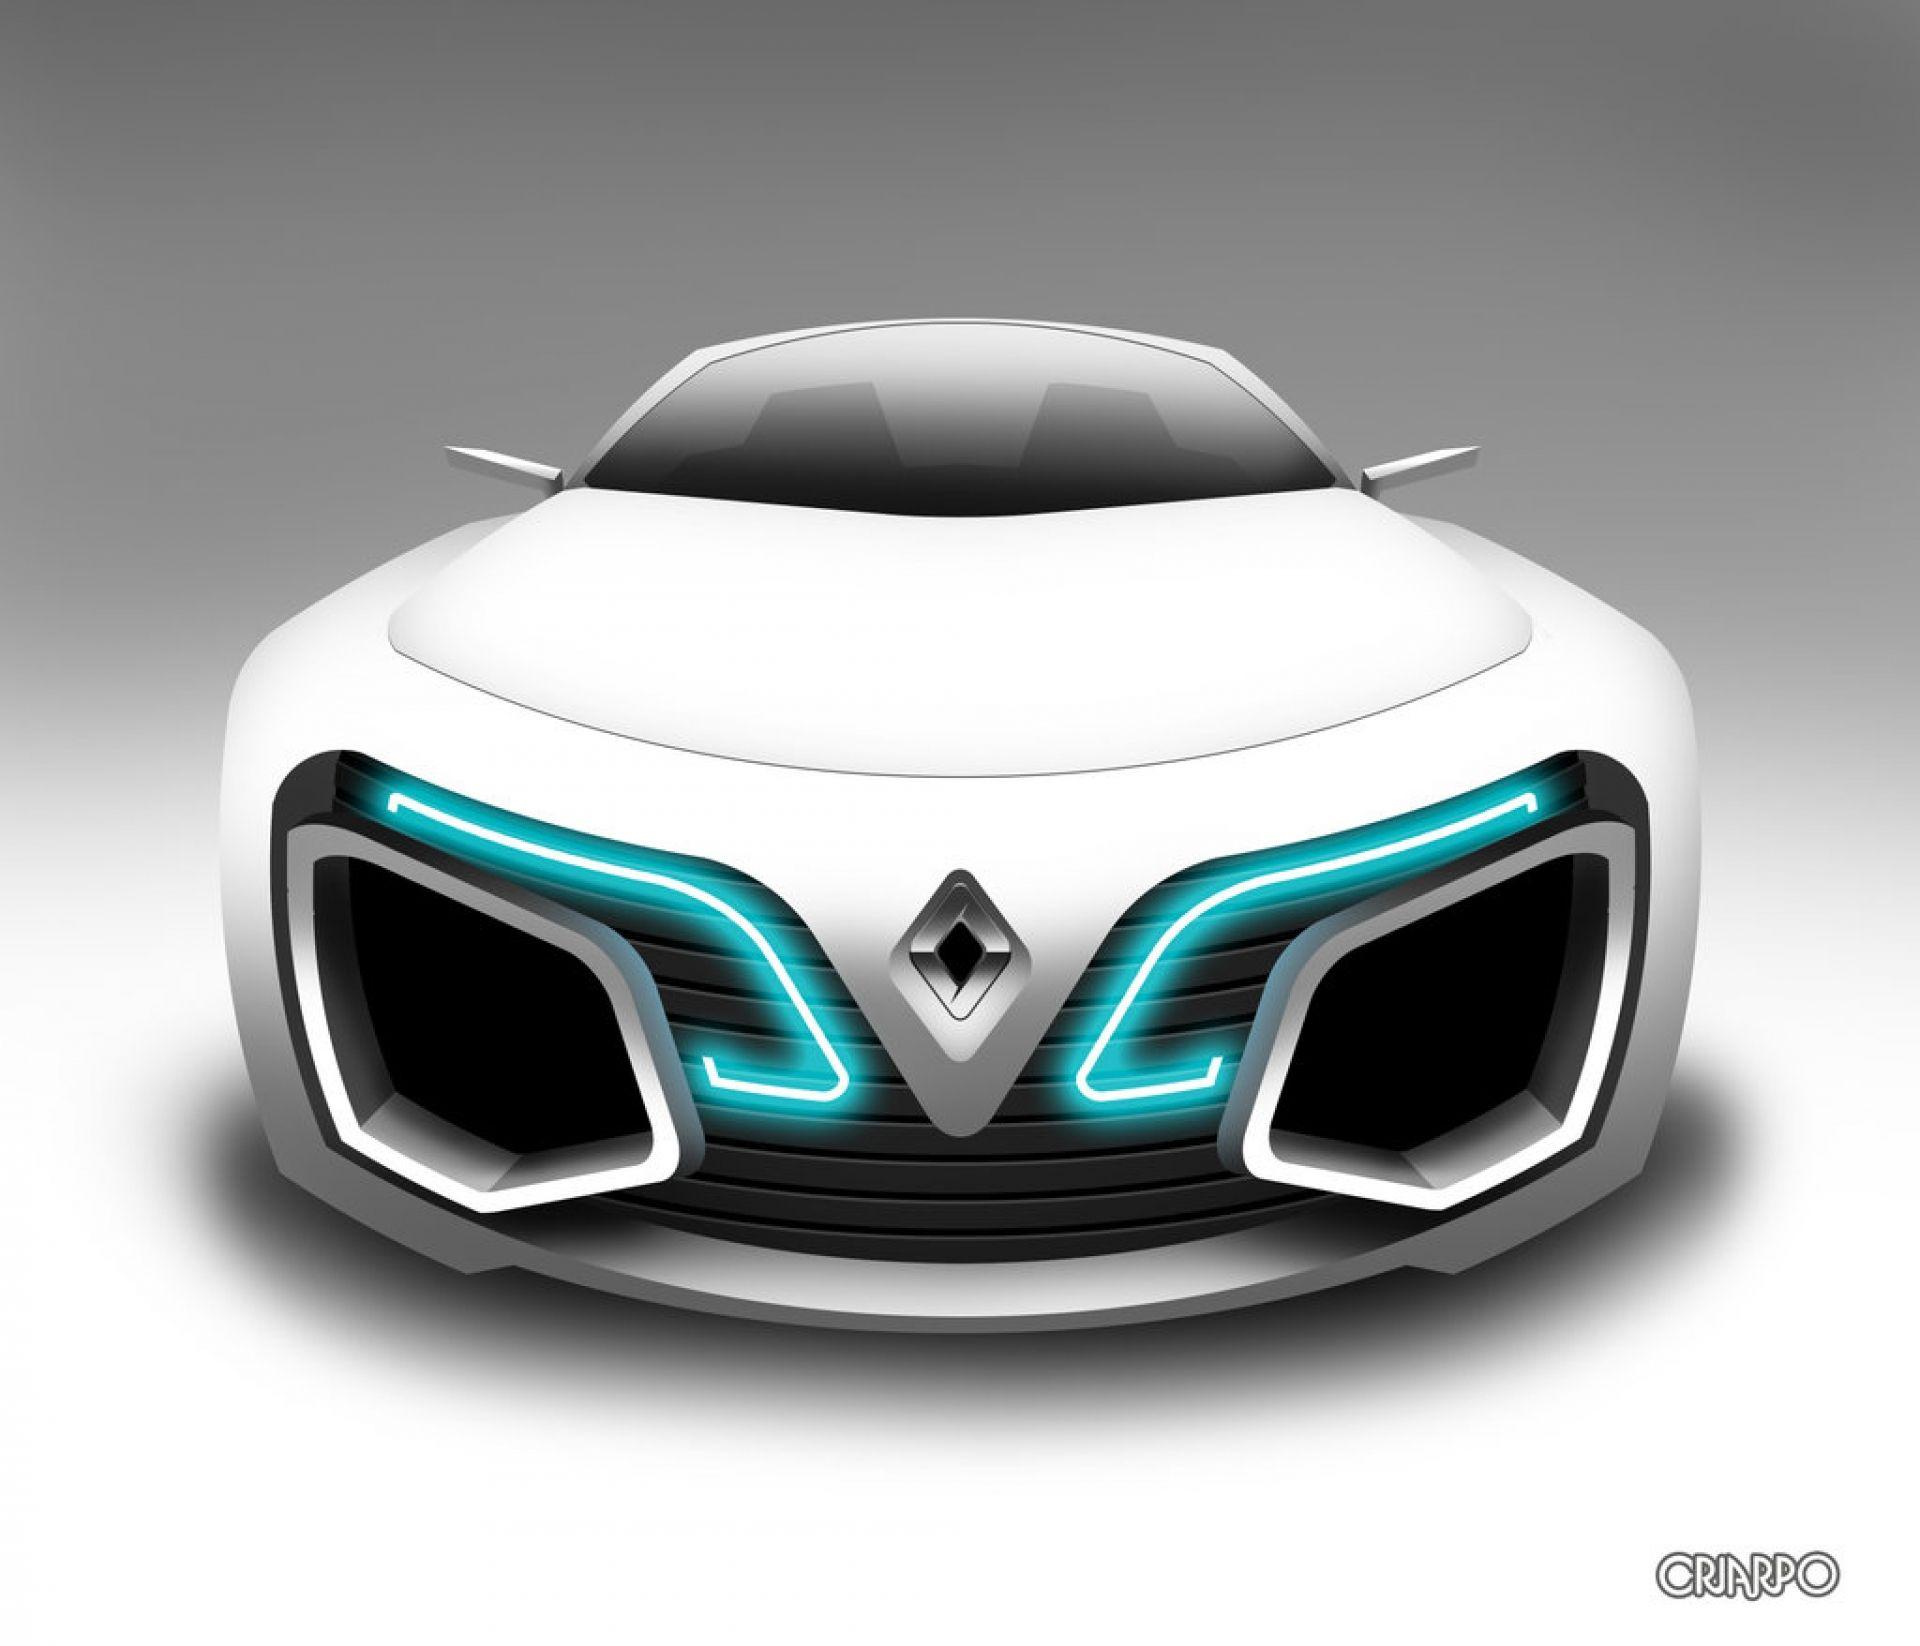 Proton Car Wallpaper: 2014 2015 Sports Cars #3030 Wallpaper